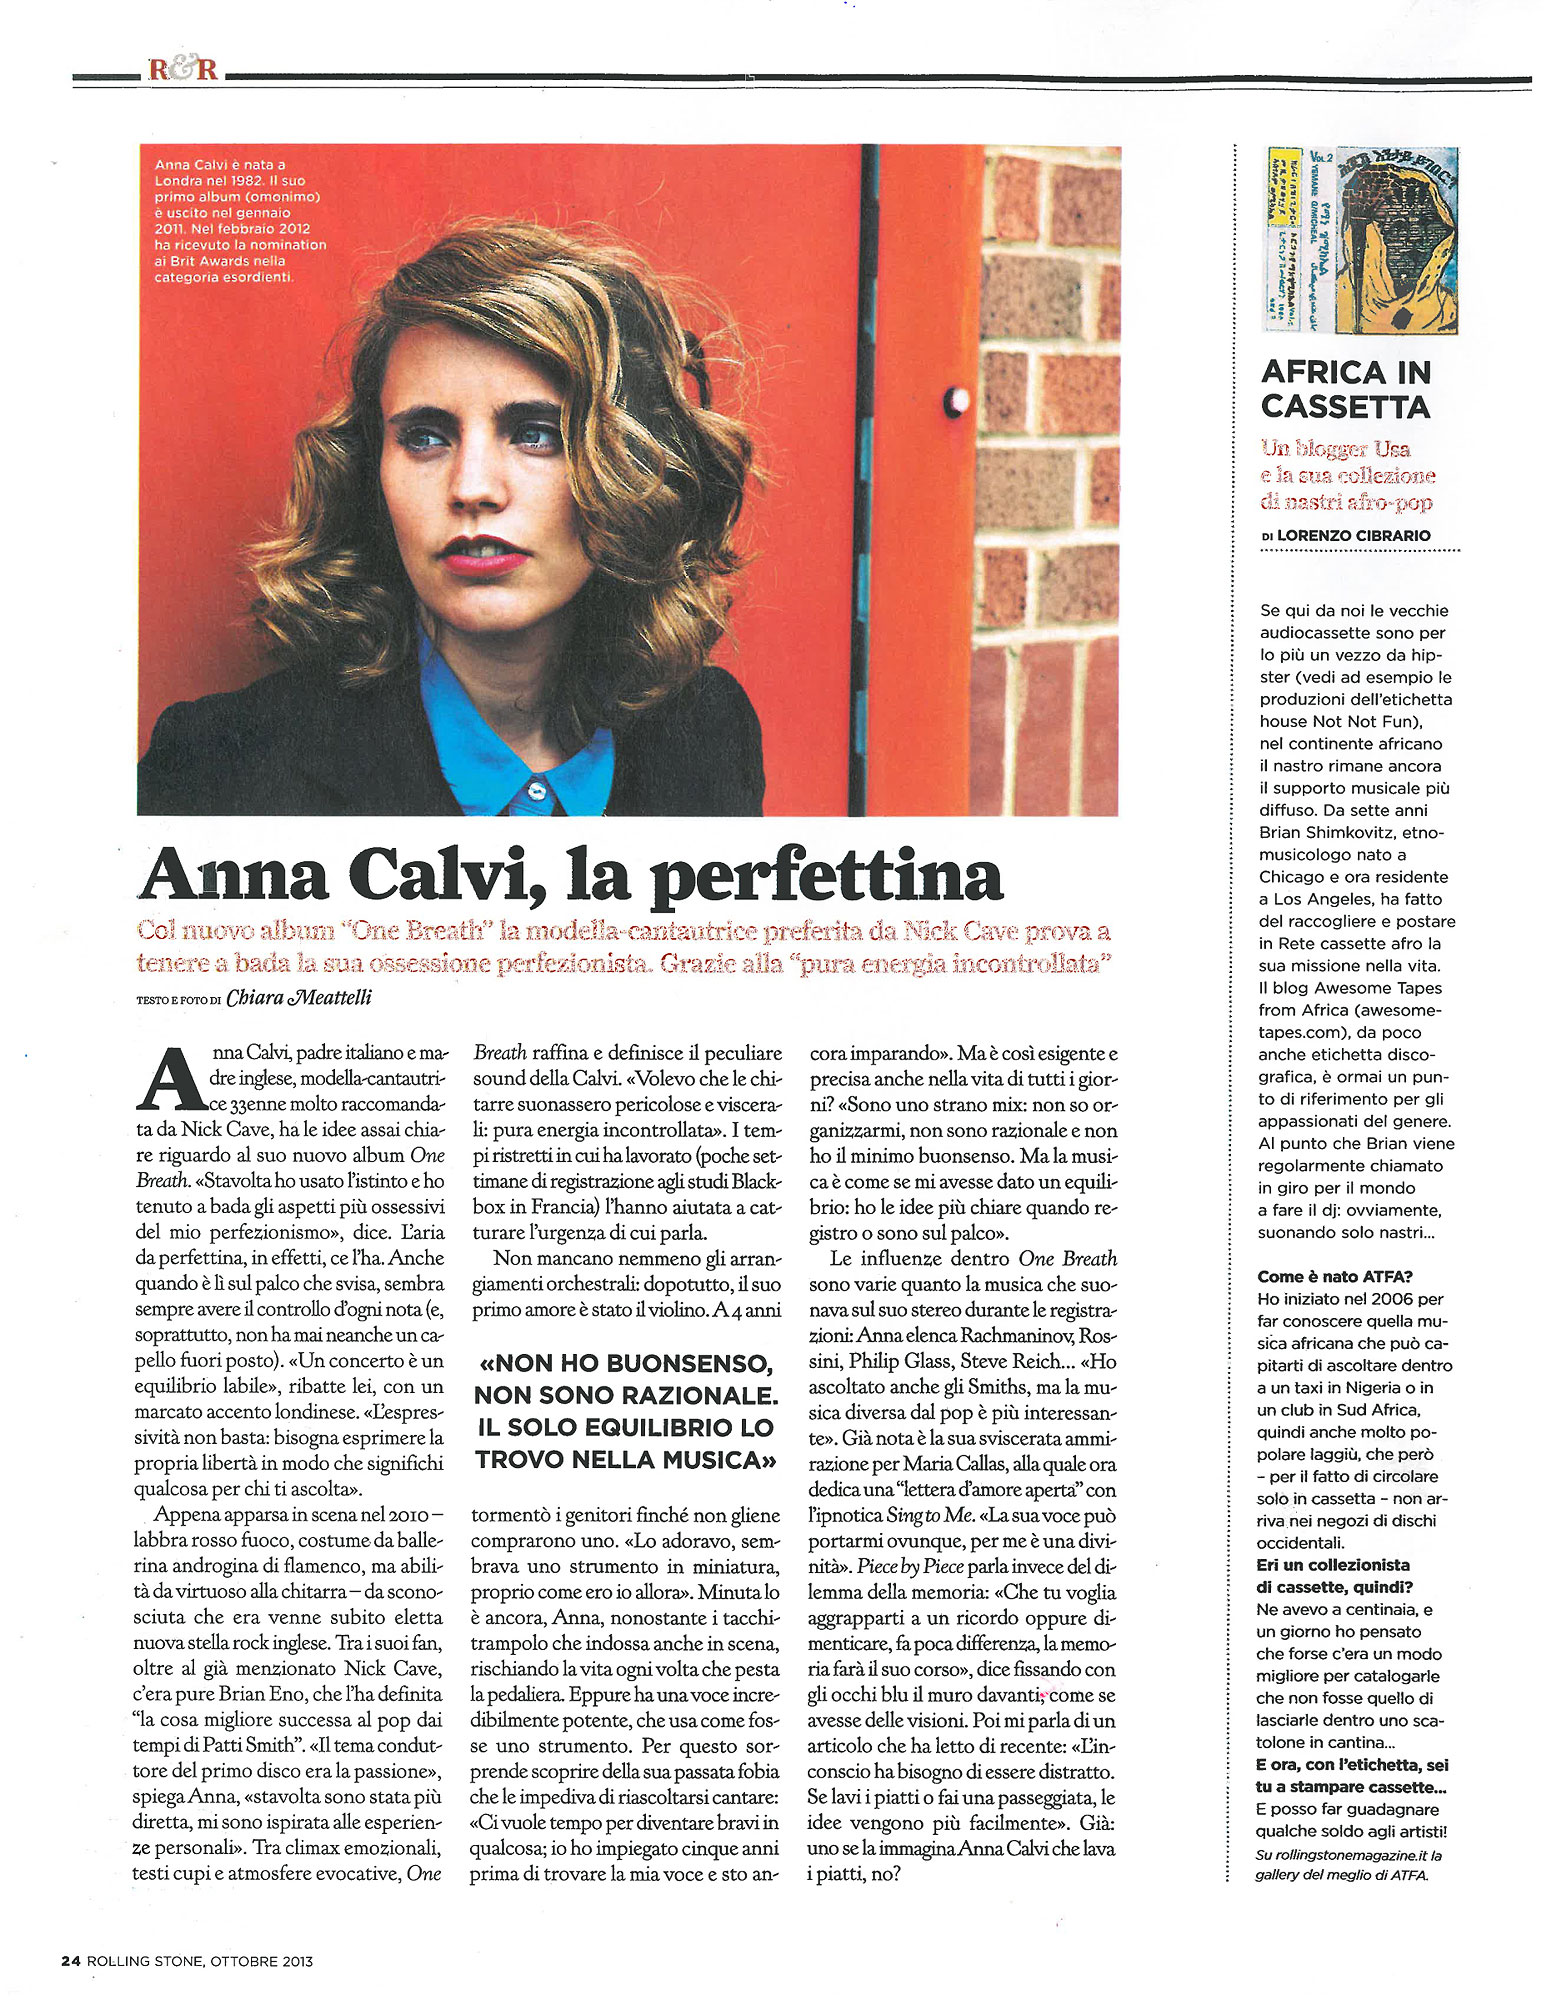 Rolling Stone magazine: Anna Calvi interview & photo